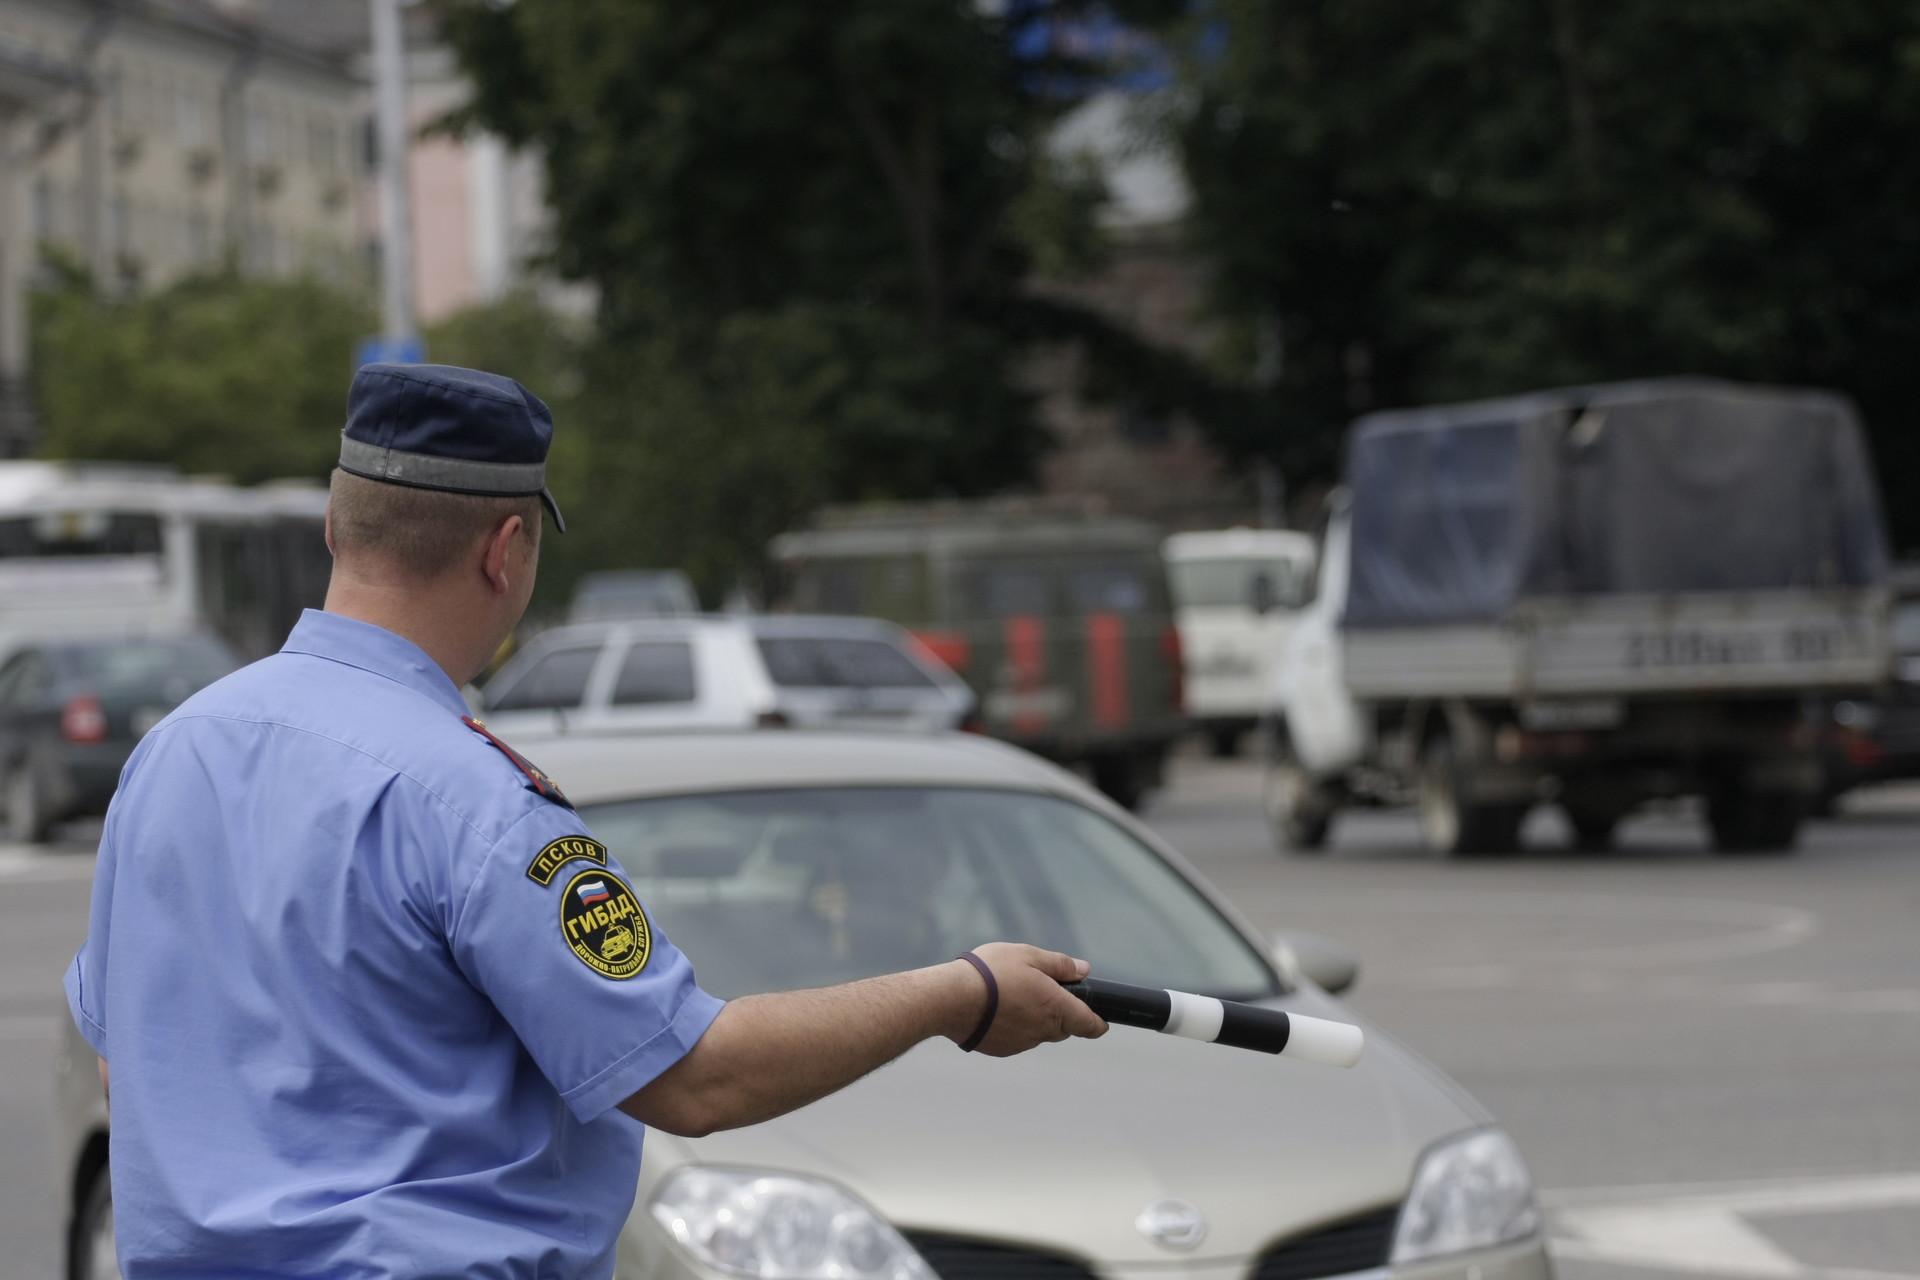 На пять дней закроют улицу Карла Маркса в Пскове. Фото Андрея Степанова.